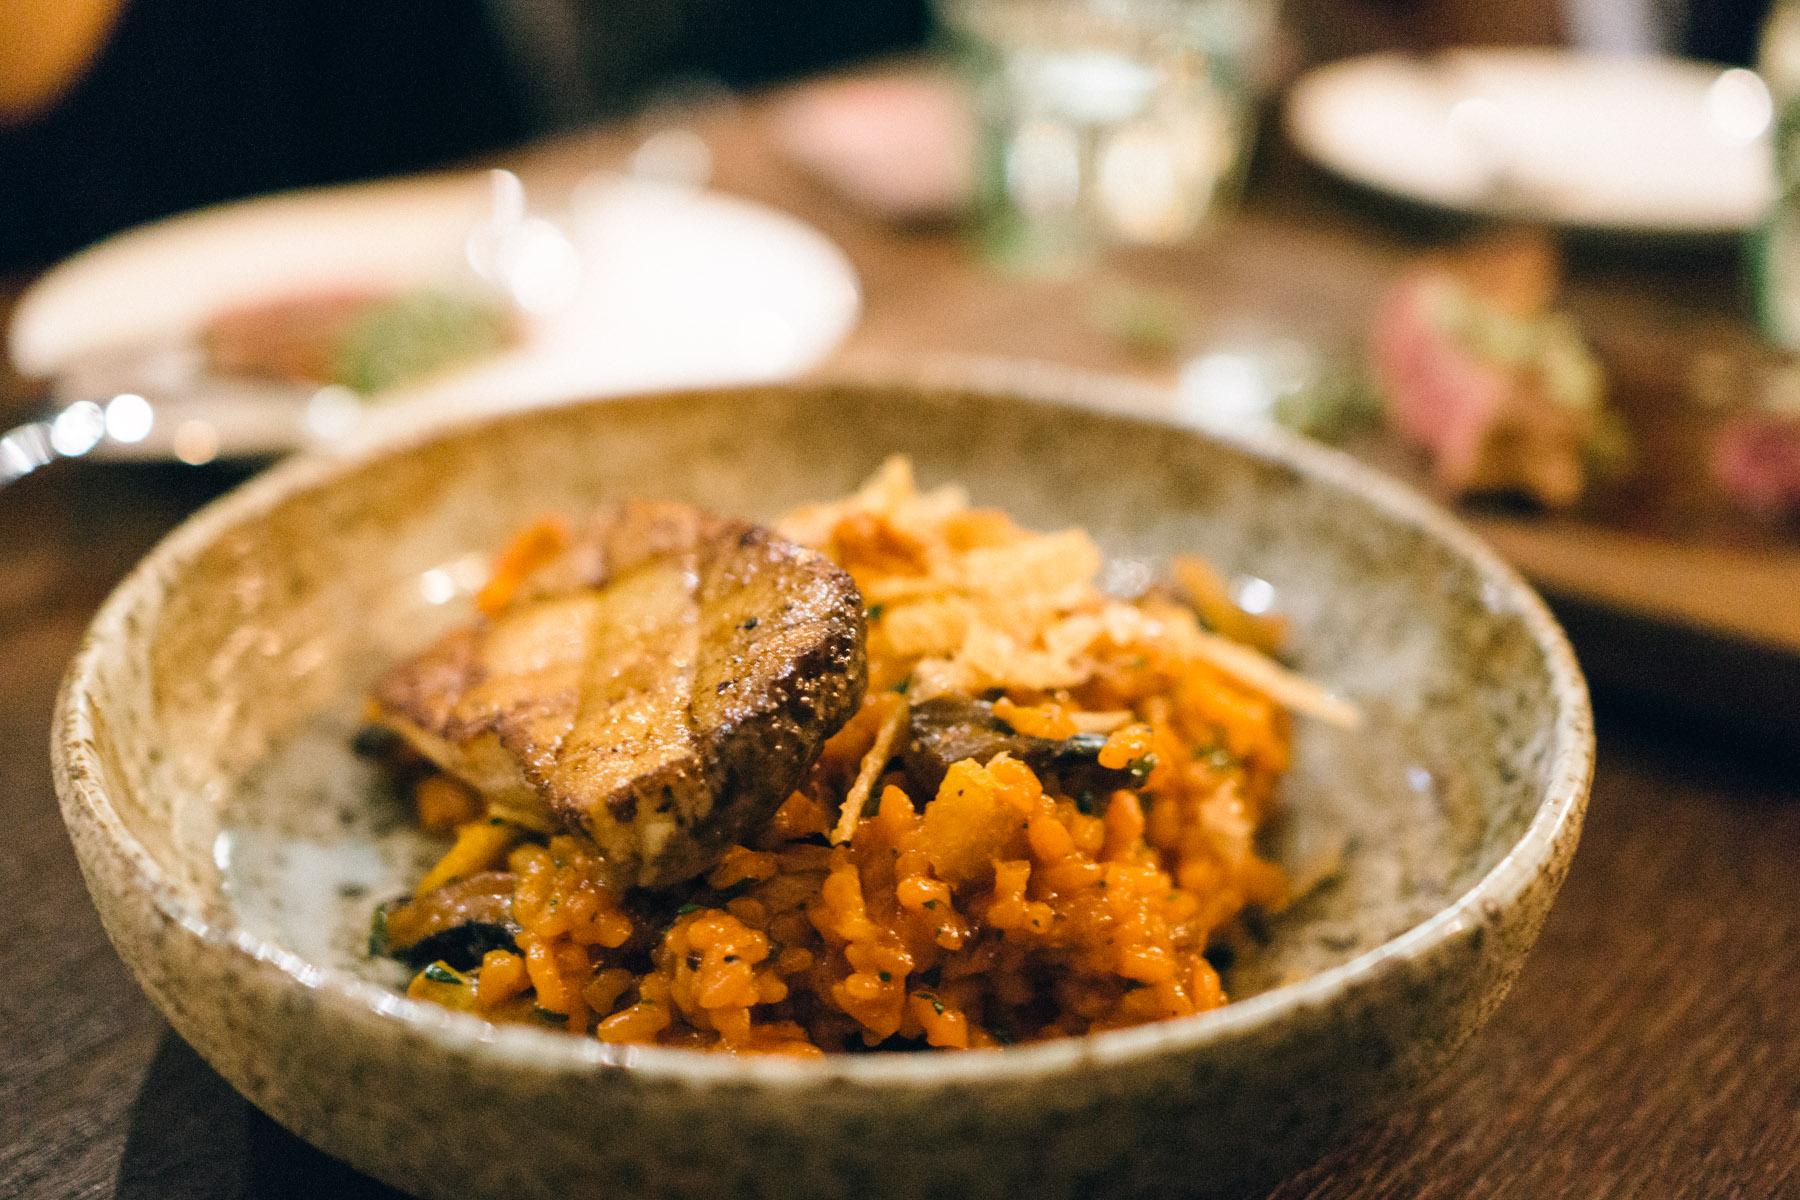 ham-and-sherry-spanish-tapas-ship-street-wan-chai-hong-kong-jason-atherton-24